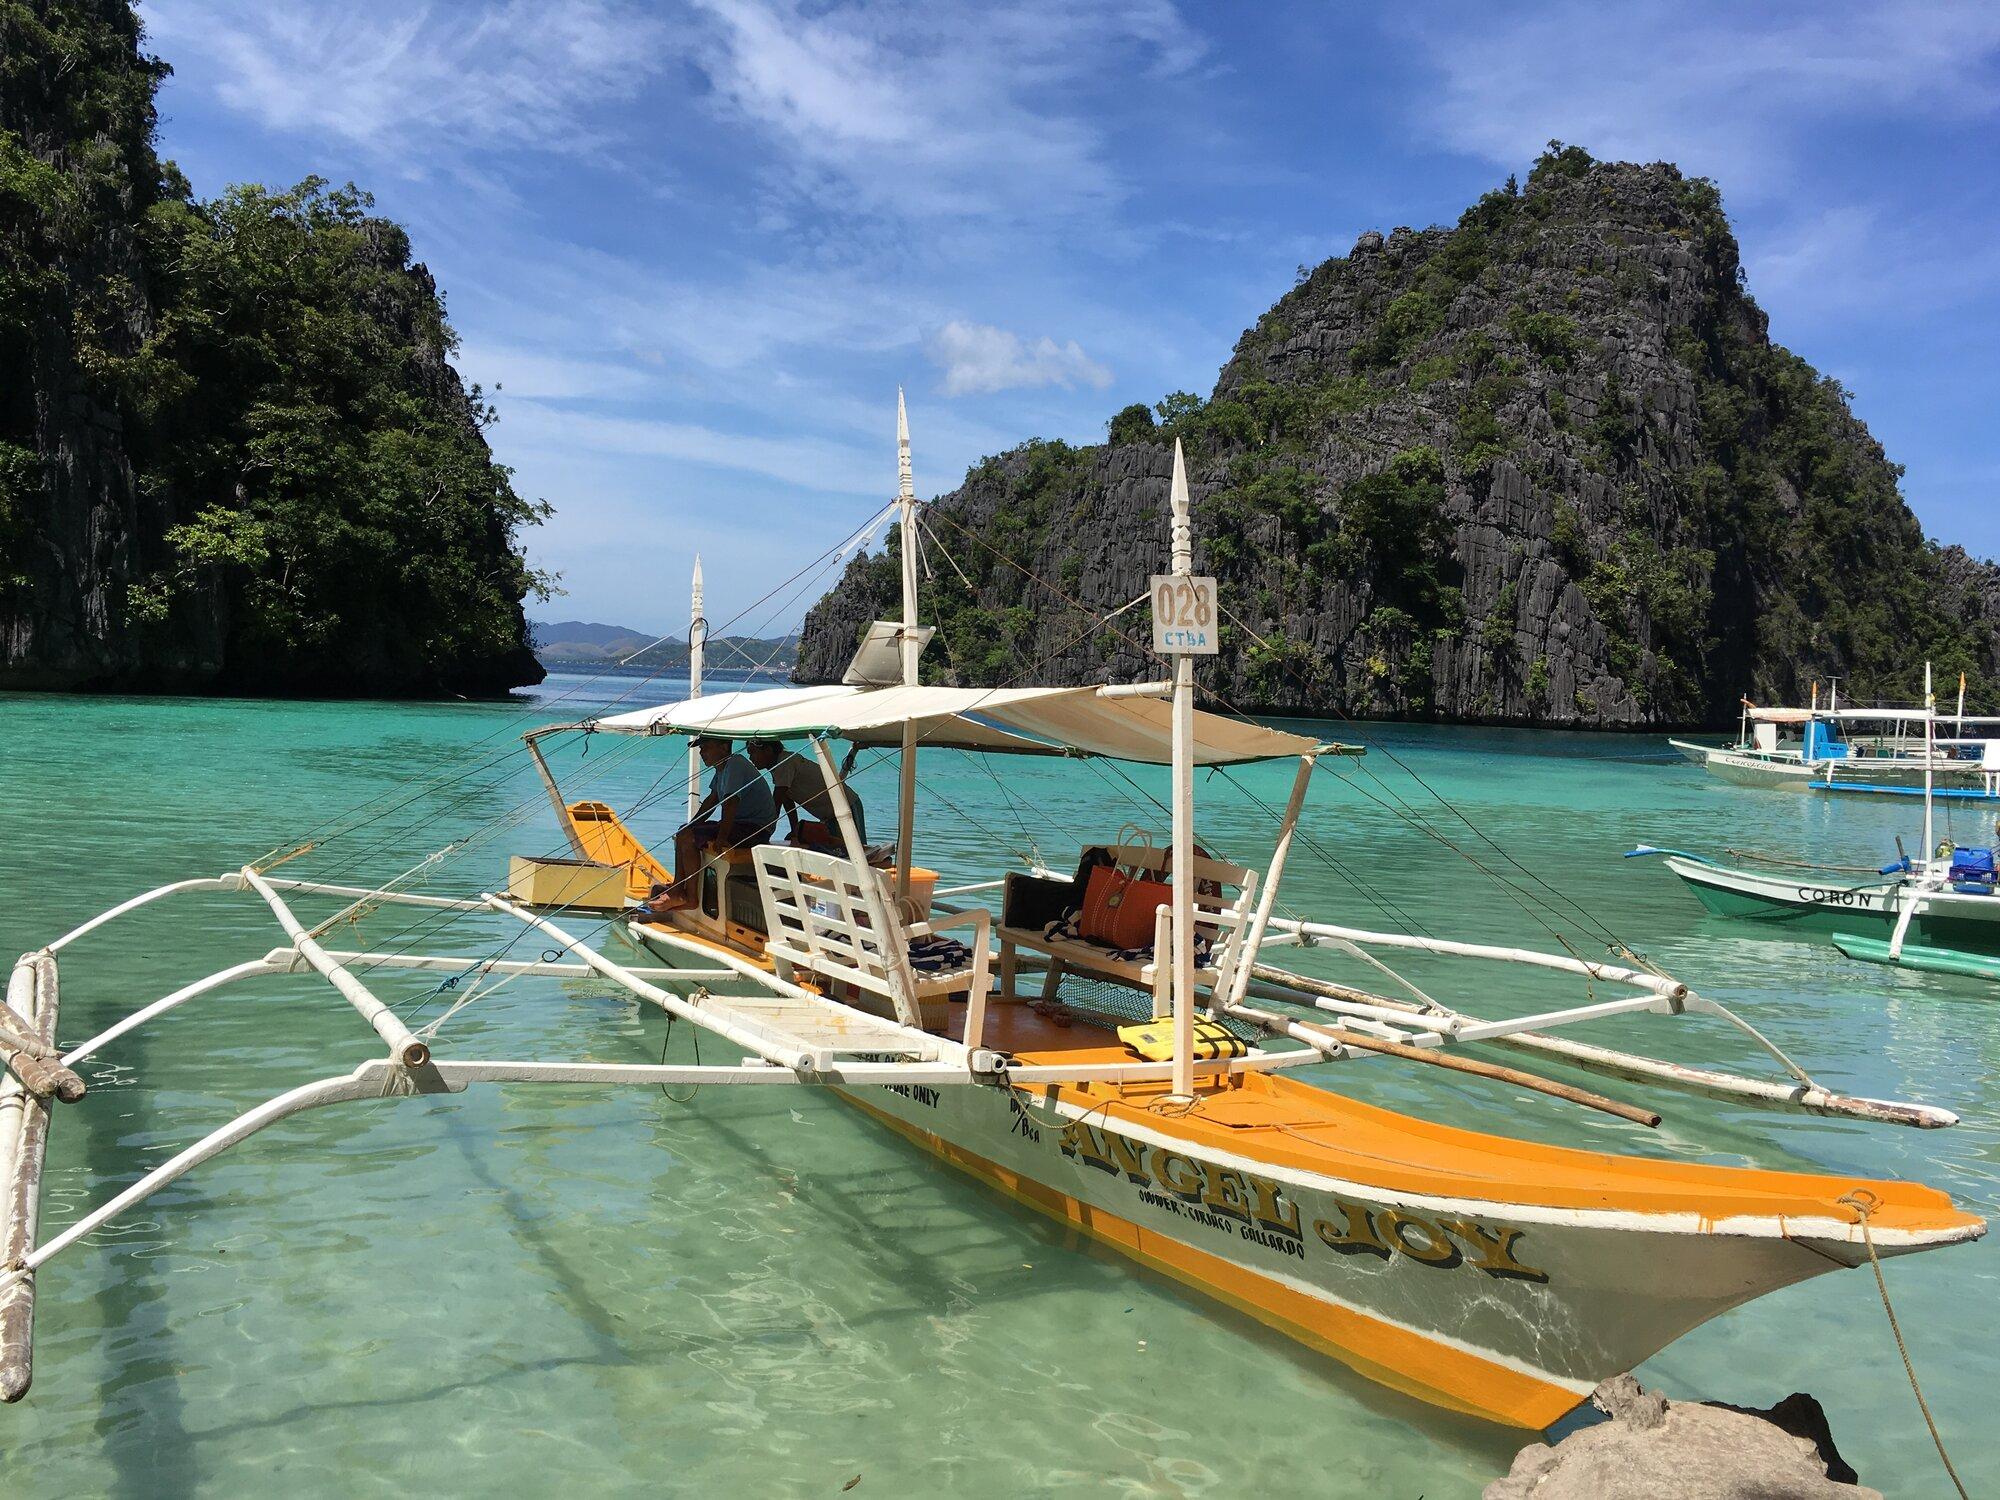 филлипинская лодка-бангка со стабилизаторами